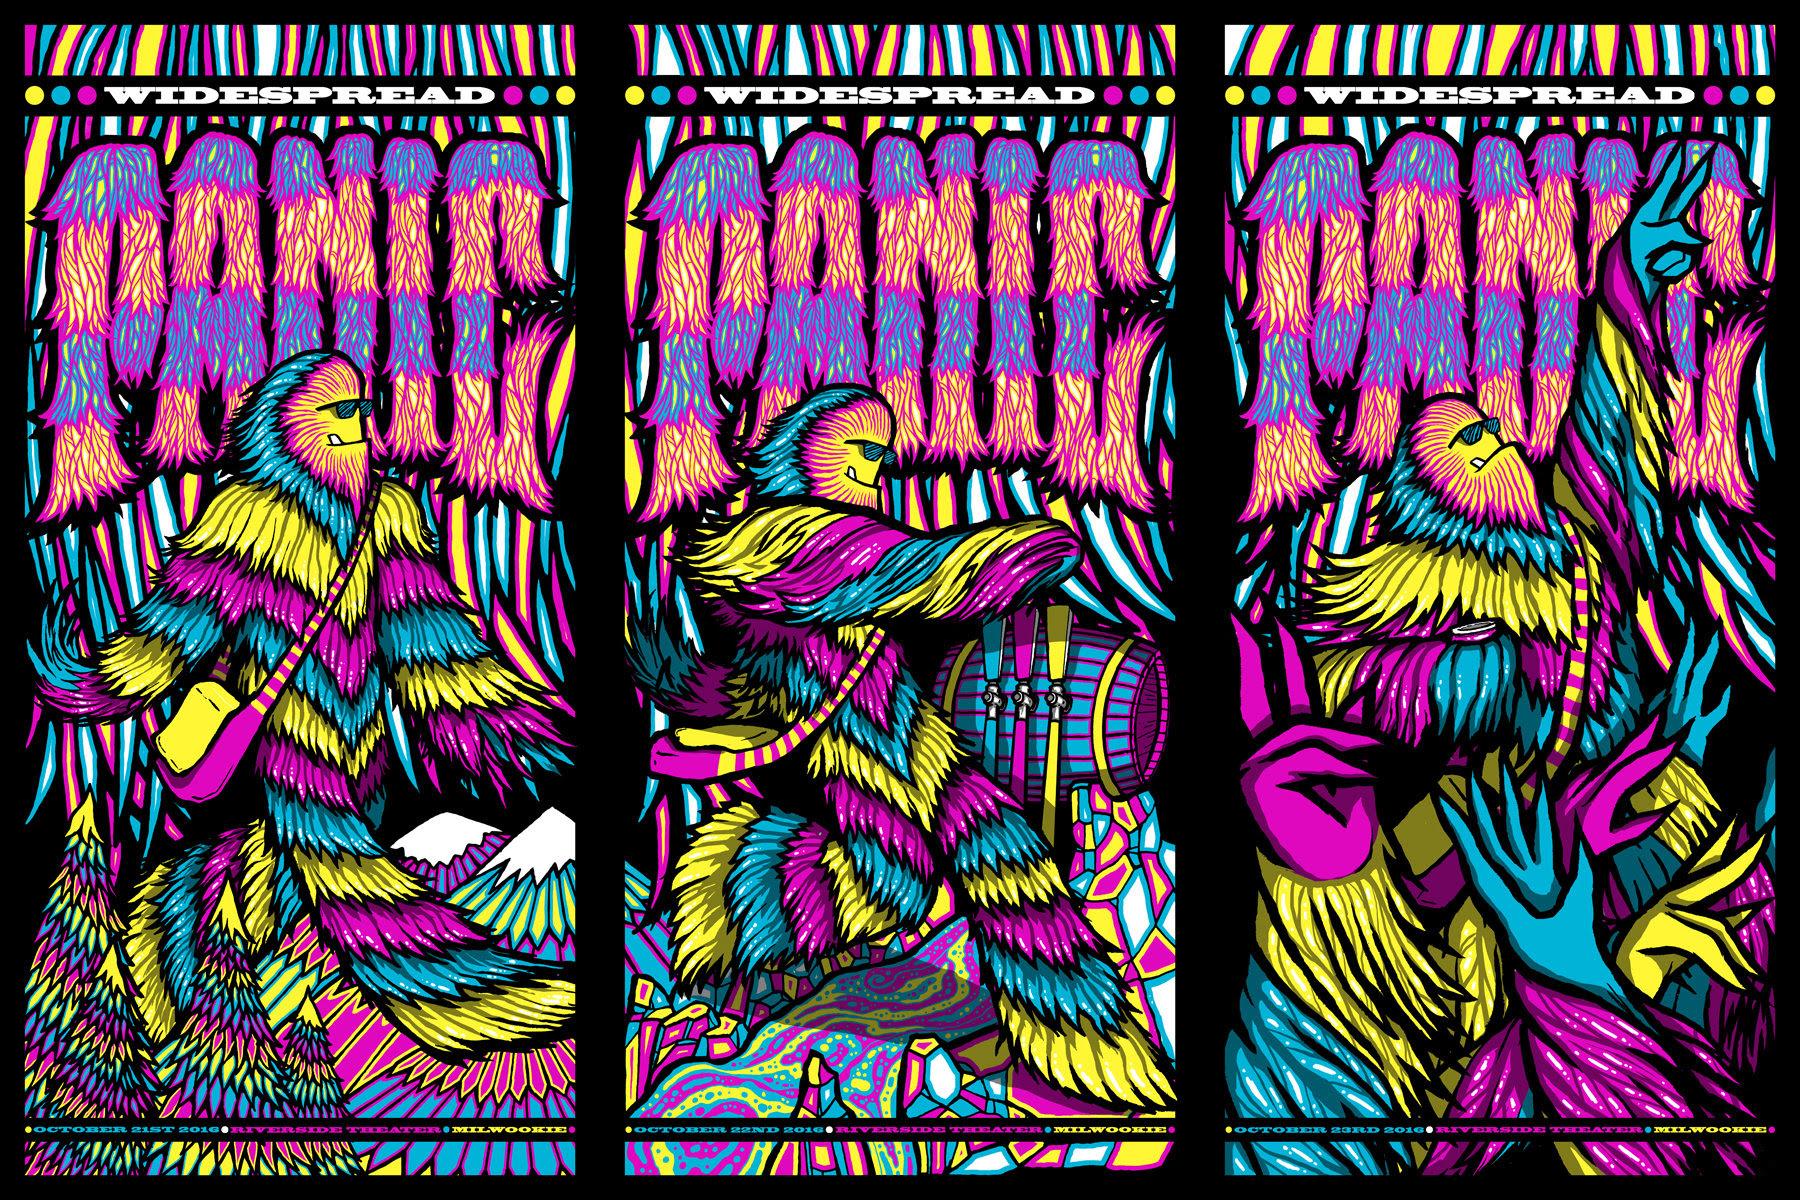 """Widespread Panic - Milwaukee, WI 2016"" by Brad Klausen.  36"" x 24"" 5-color Screenprint.  Ed of 100 S/N.  $90"